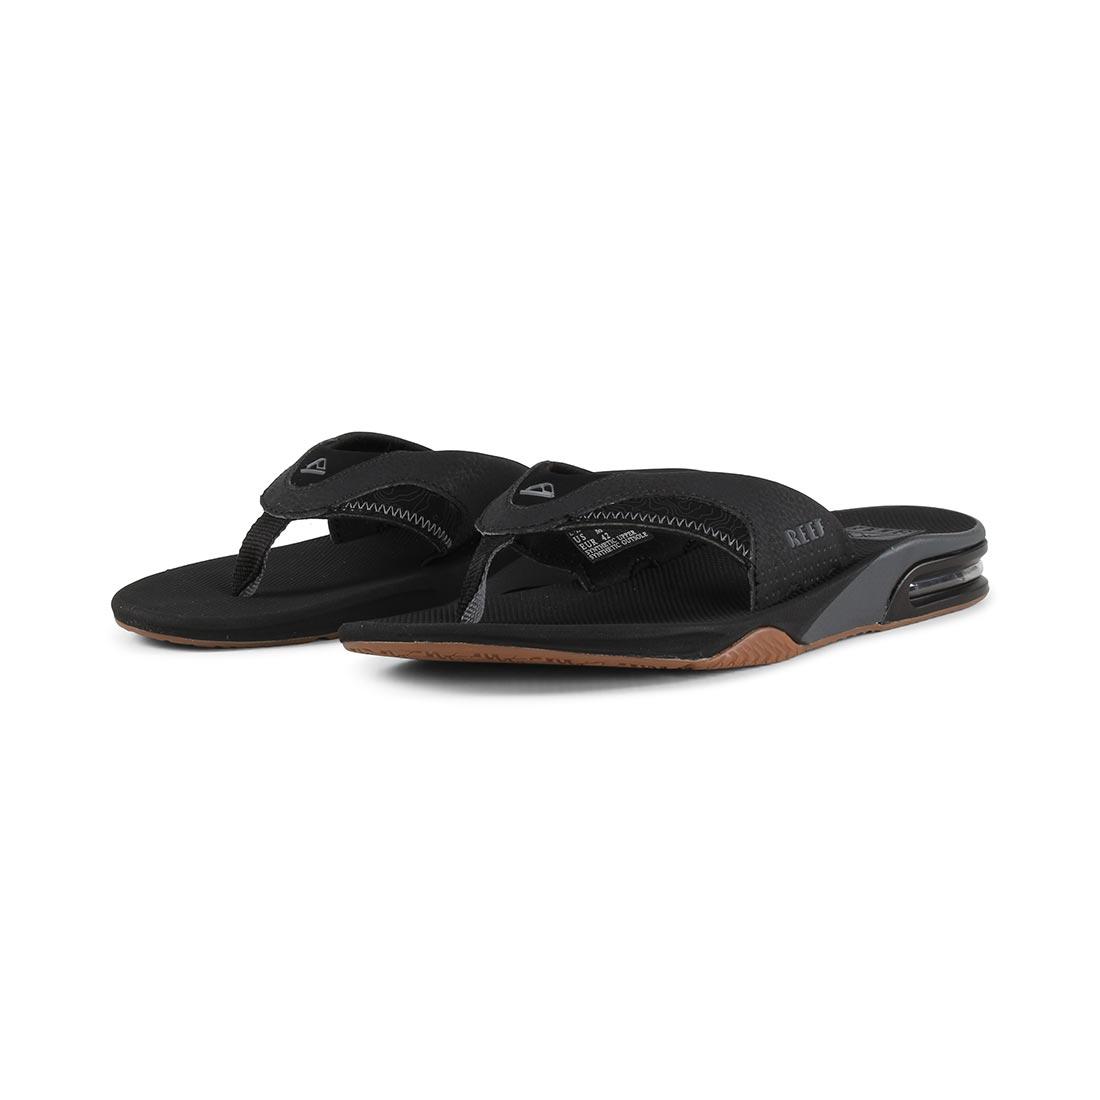 1bd6badc05f7 Reef-Fanning-Prints-Sandals-Tan-Topo-03